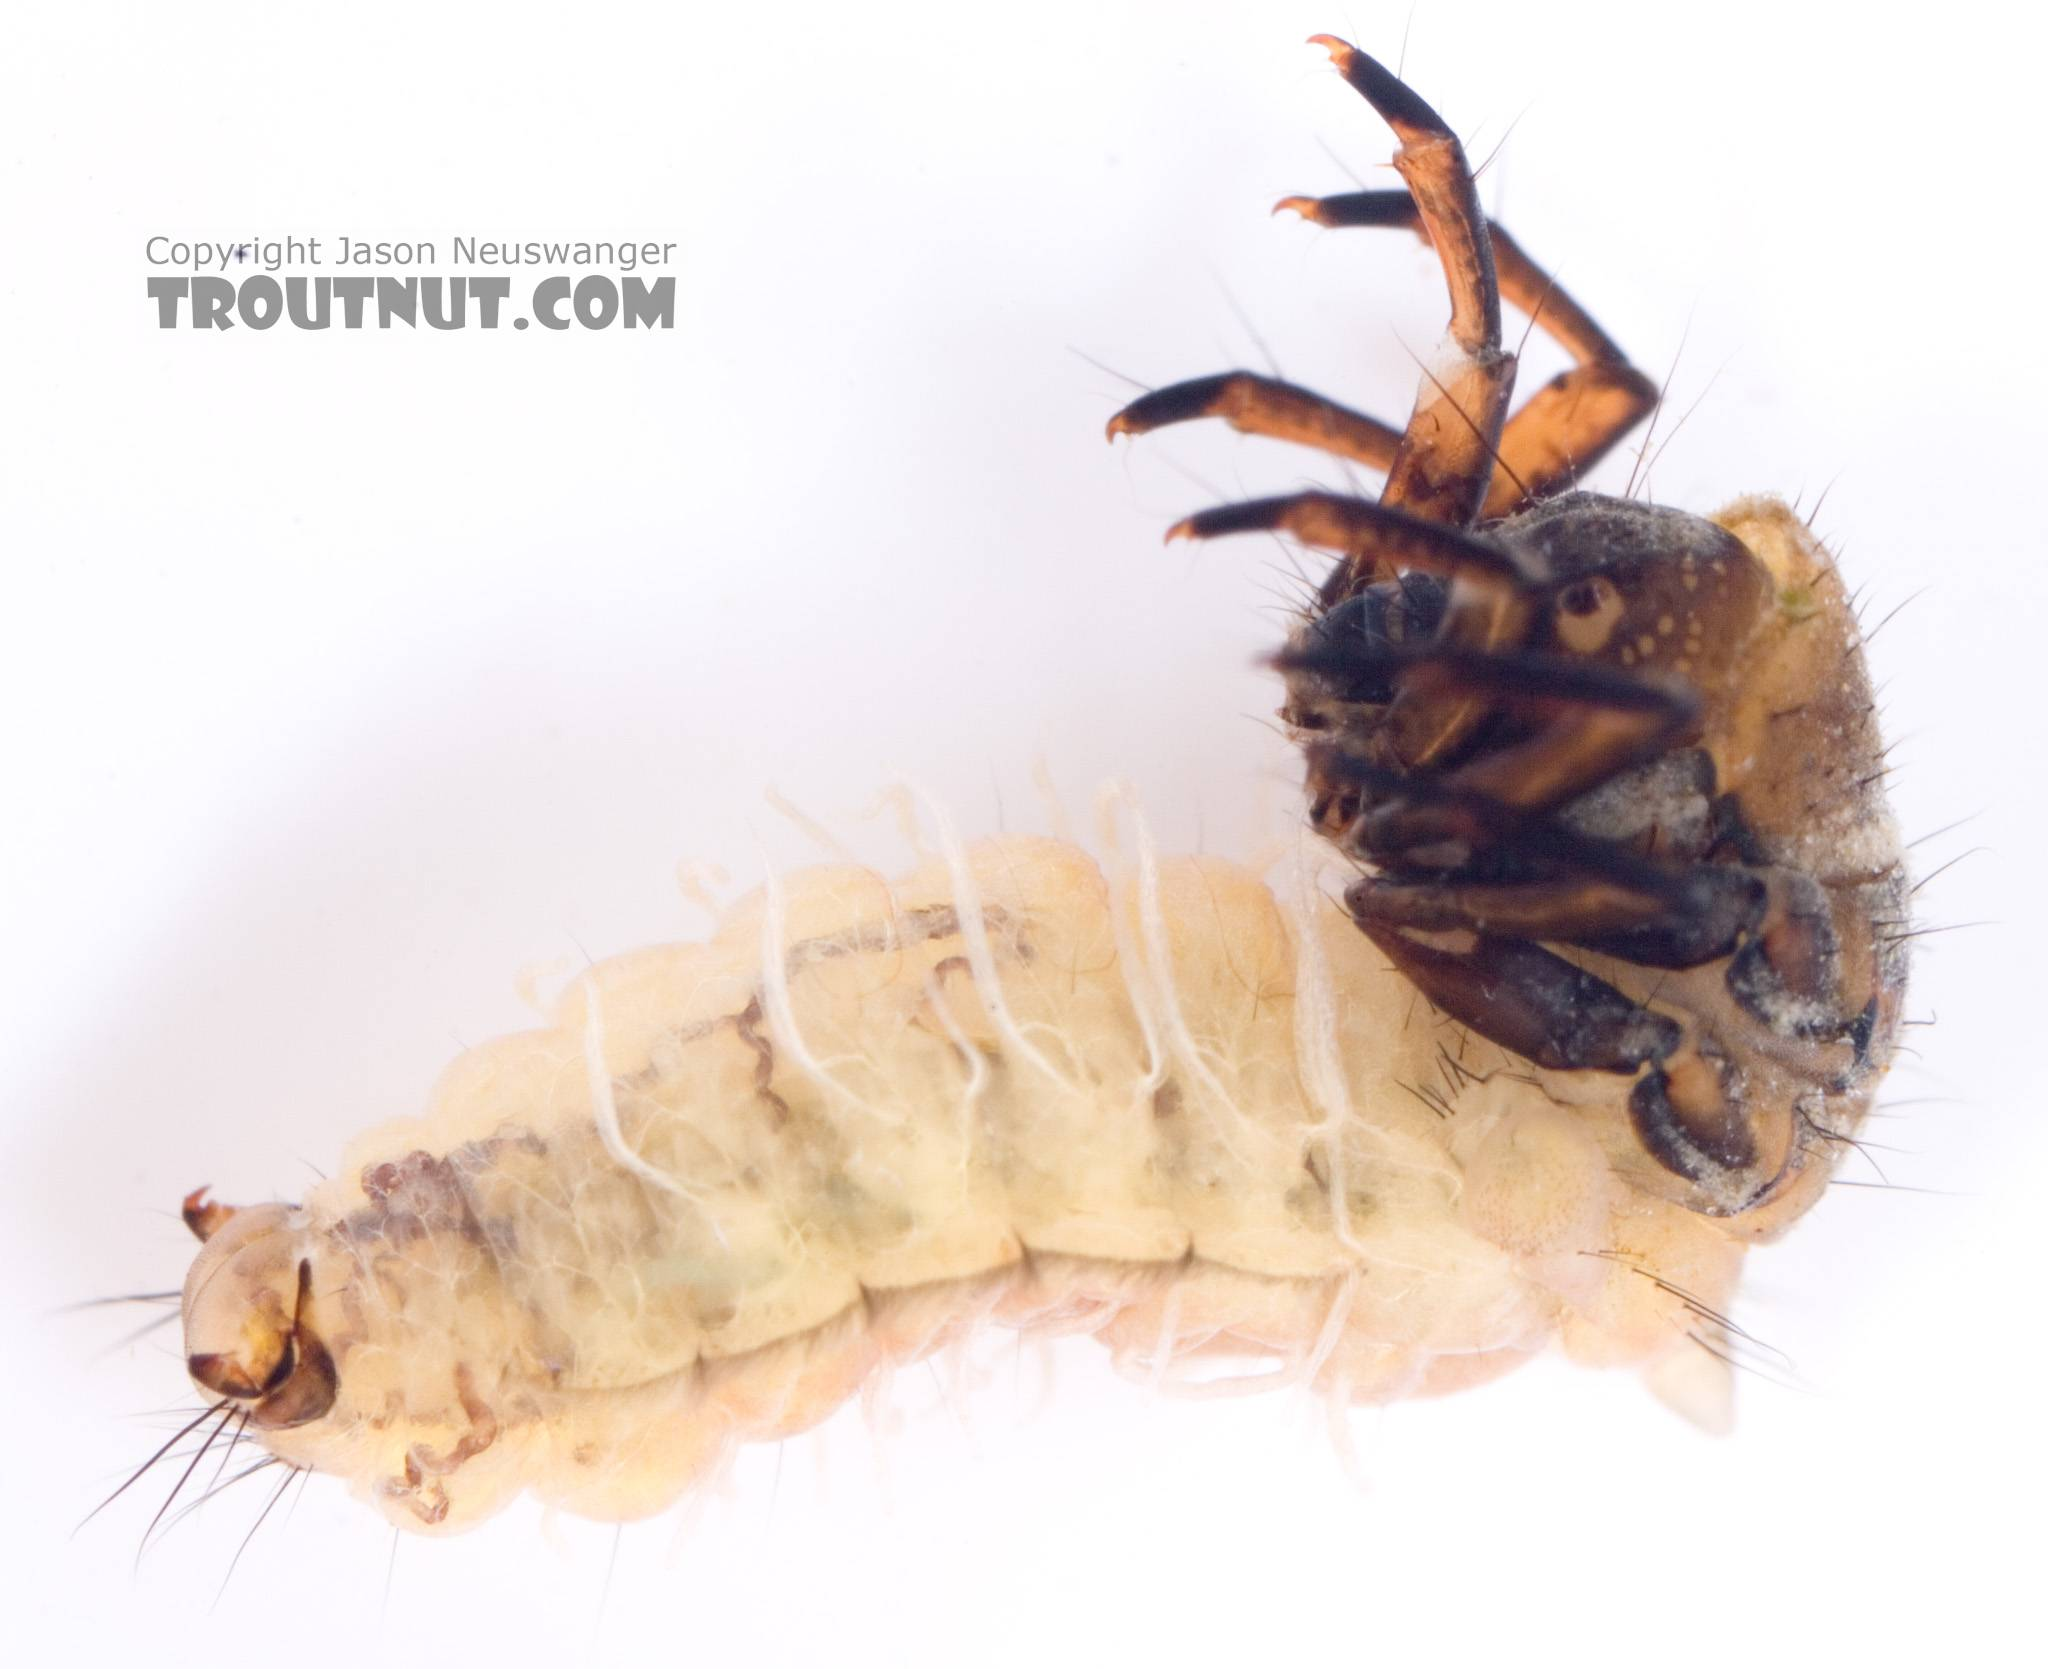 Neophylax (Autumn Mottled Sedges) Caddisfly Larva from Cayuta Creek in New York